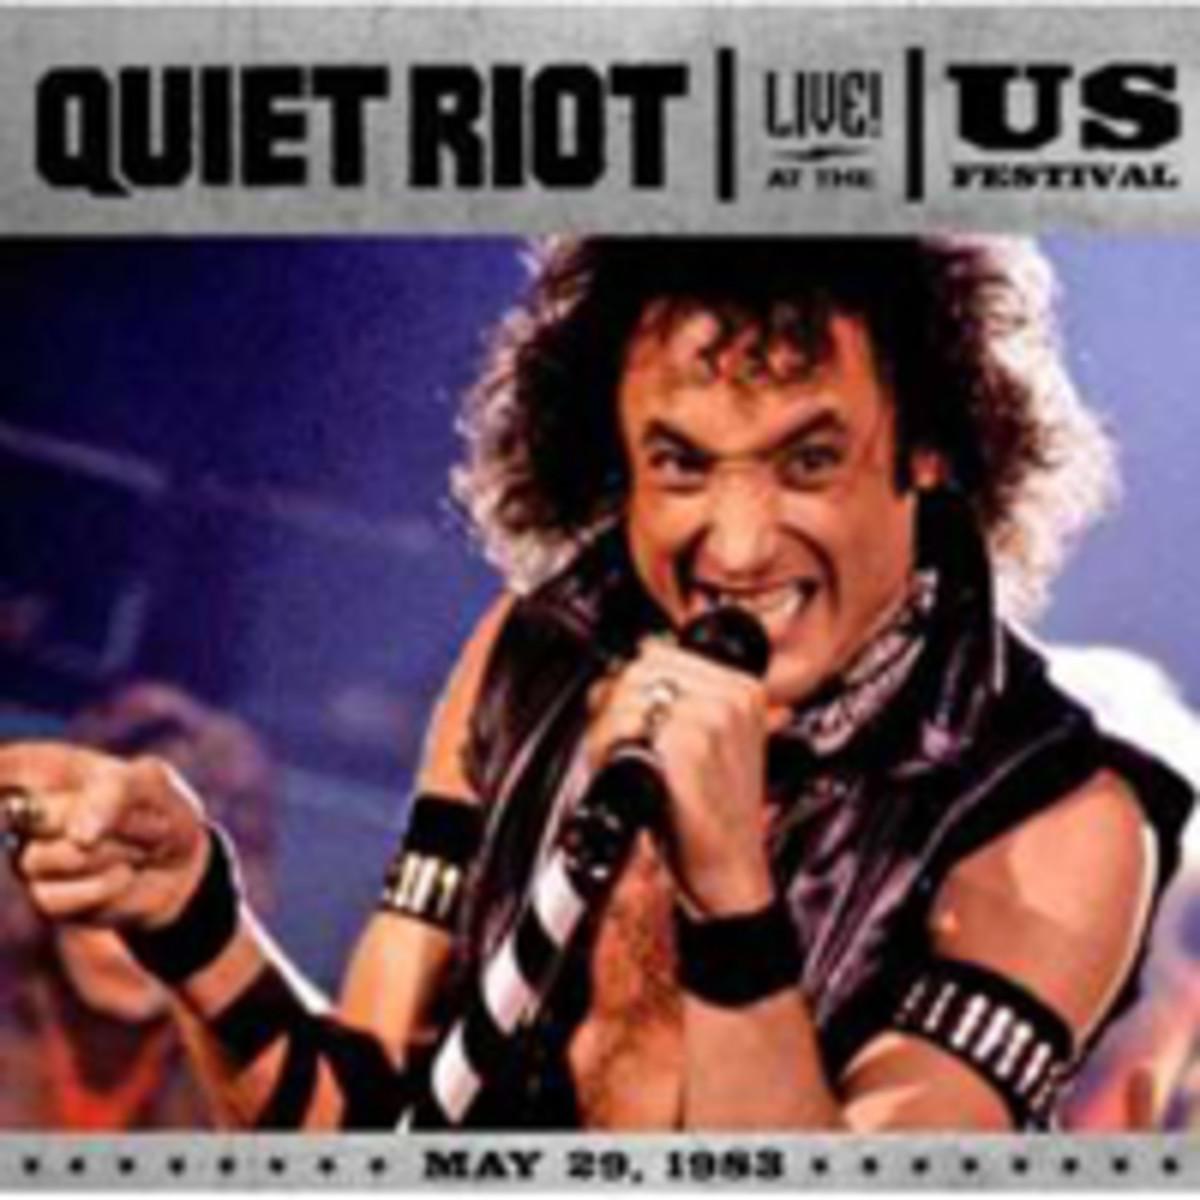 Quiet Riot Live At The US Festival 1983